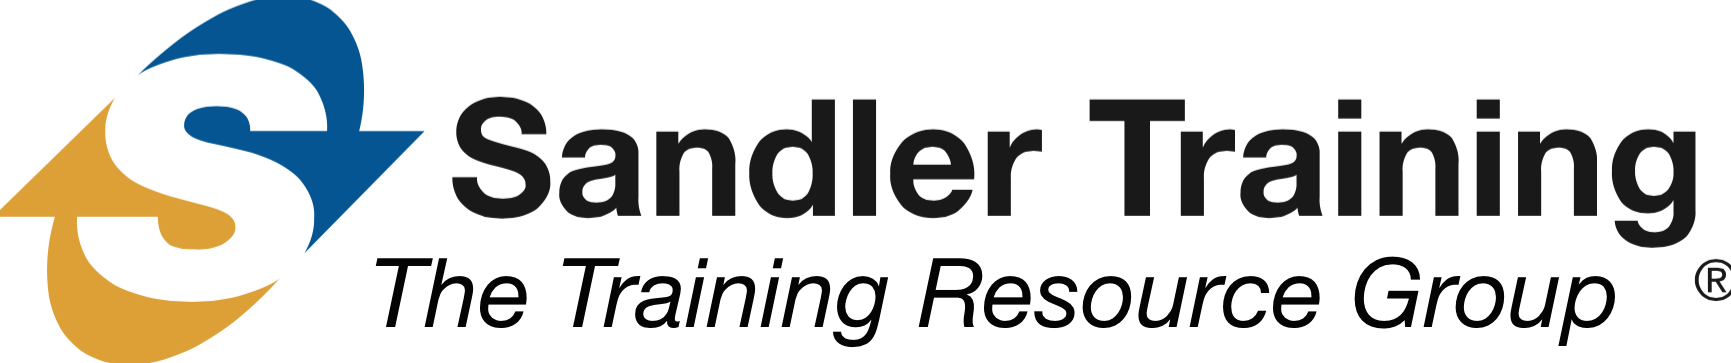 trg-sandler-logo